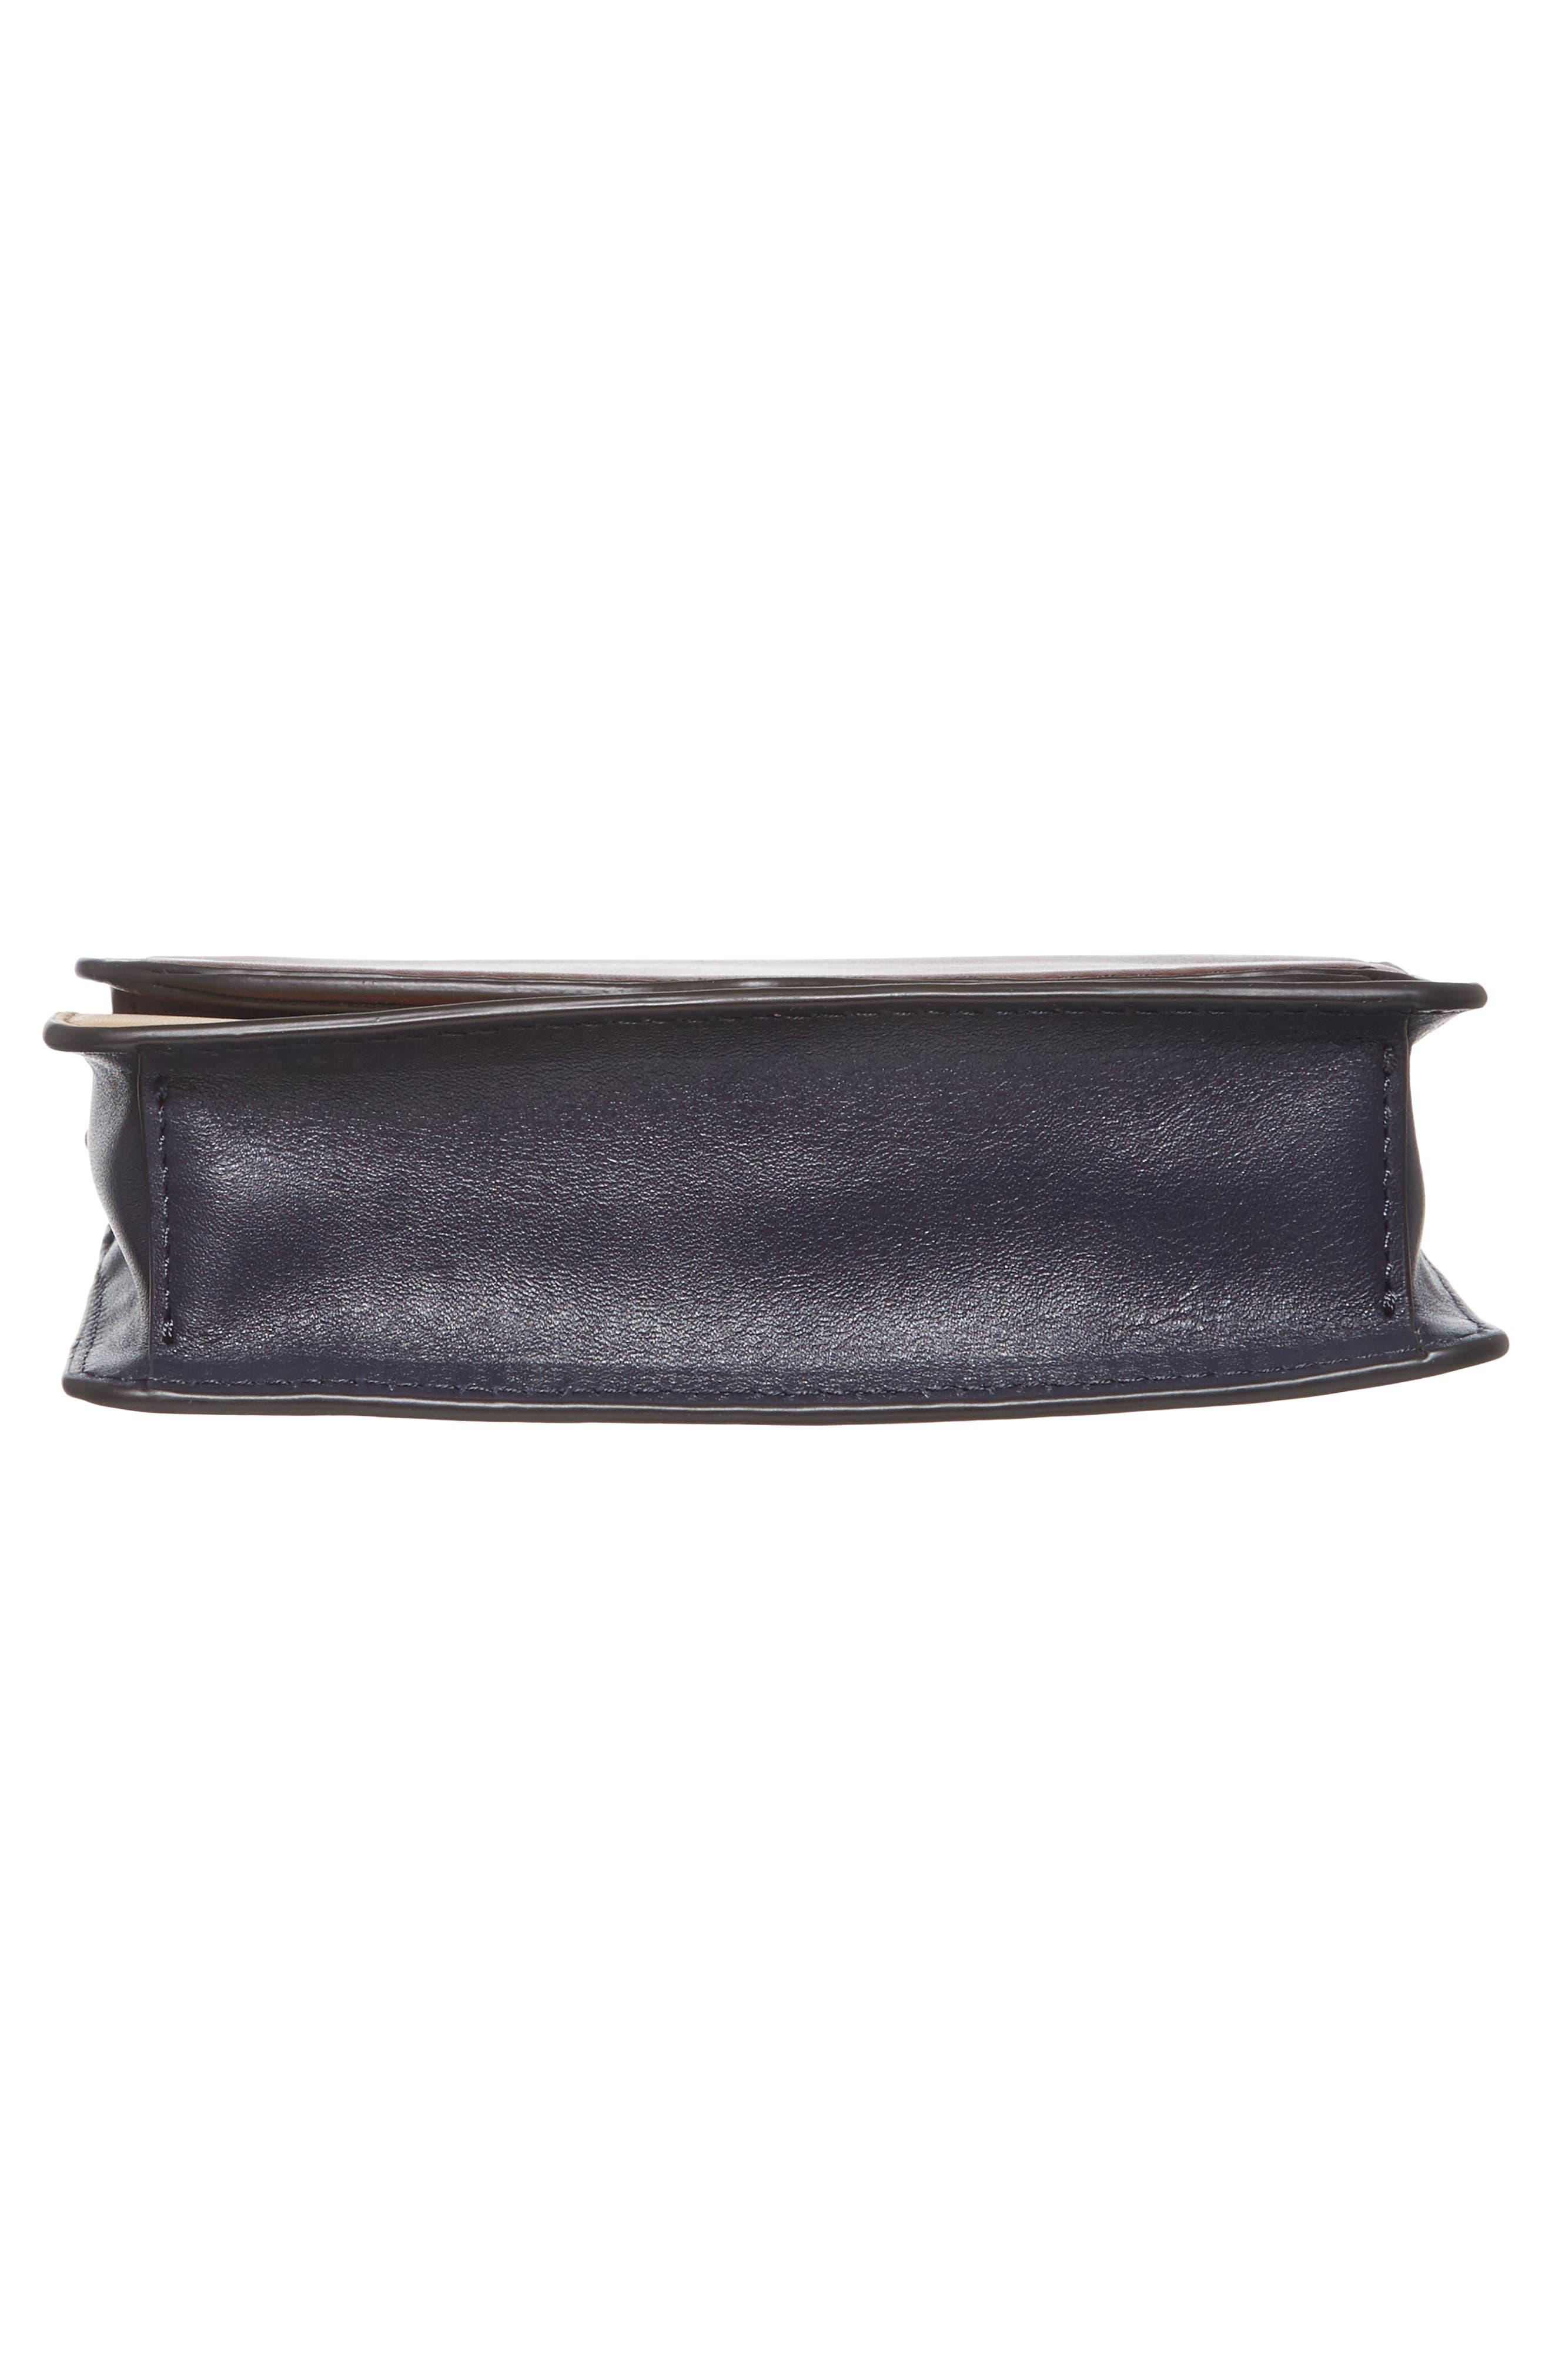 Mini Chain Leather Crossbody Bag,                             Alternate thumbnail 6, color,                             600